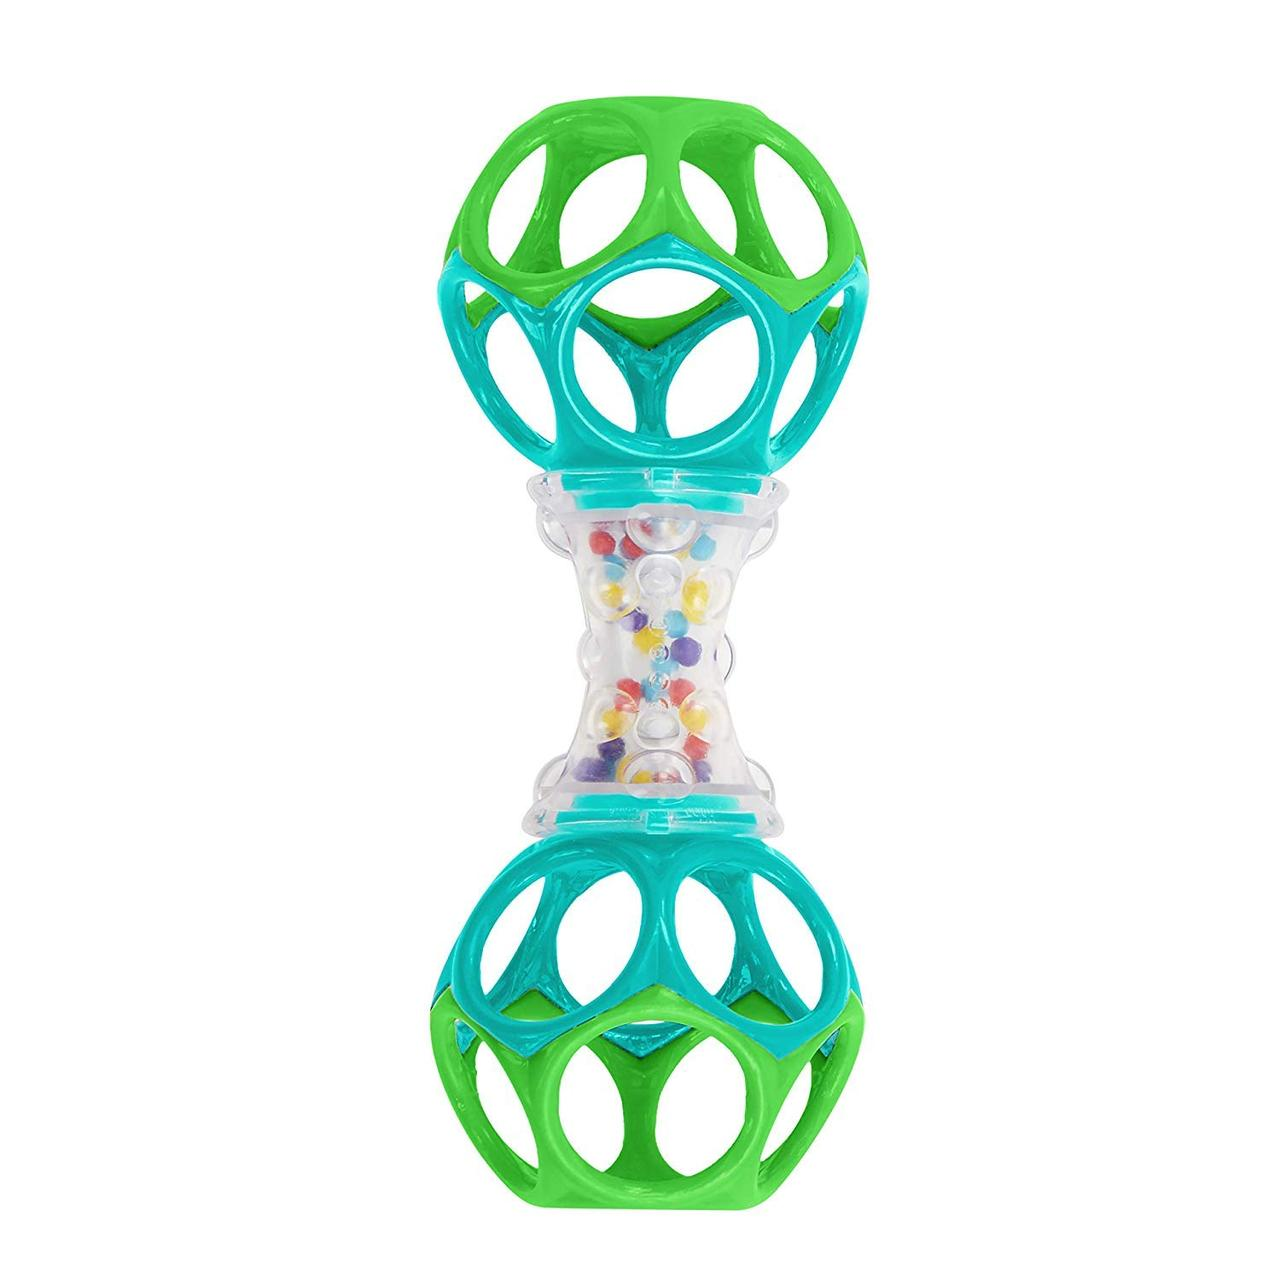 Погремушка O Ball Bright Starts Oball Shaker Rattle Toy